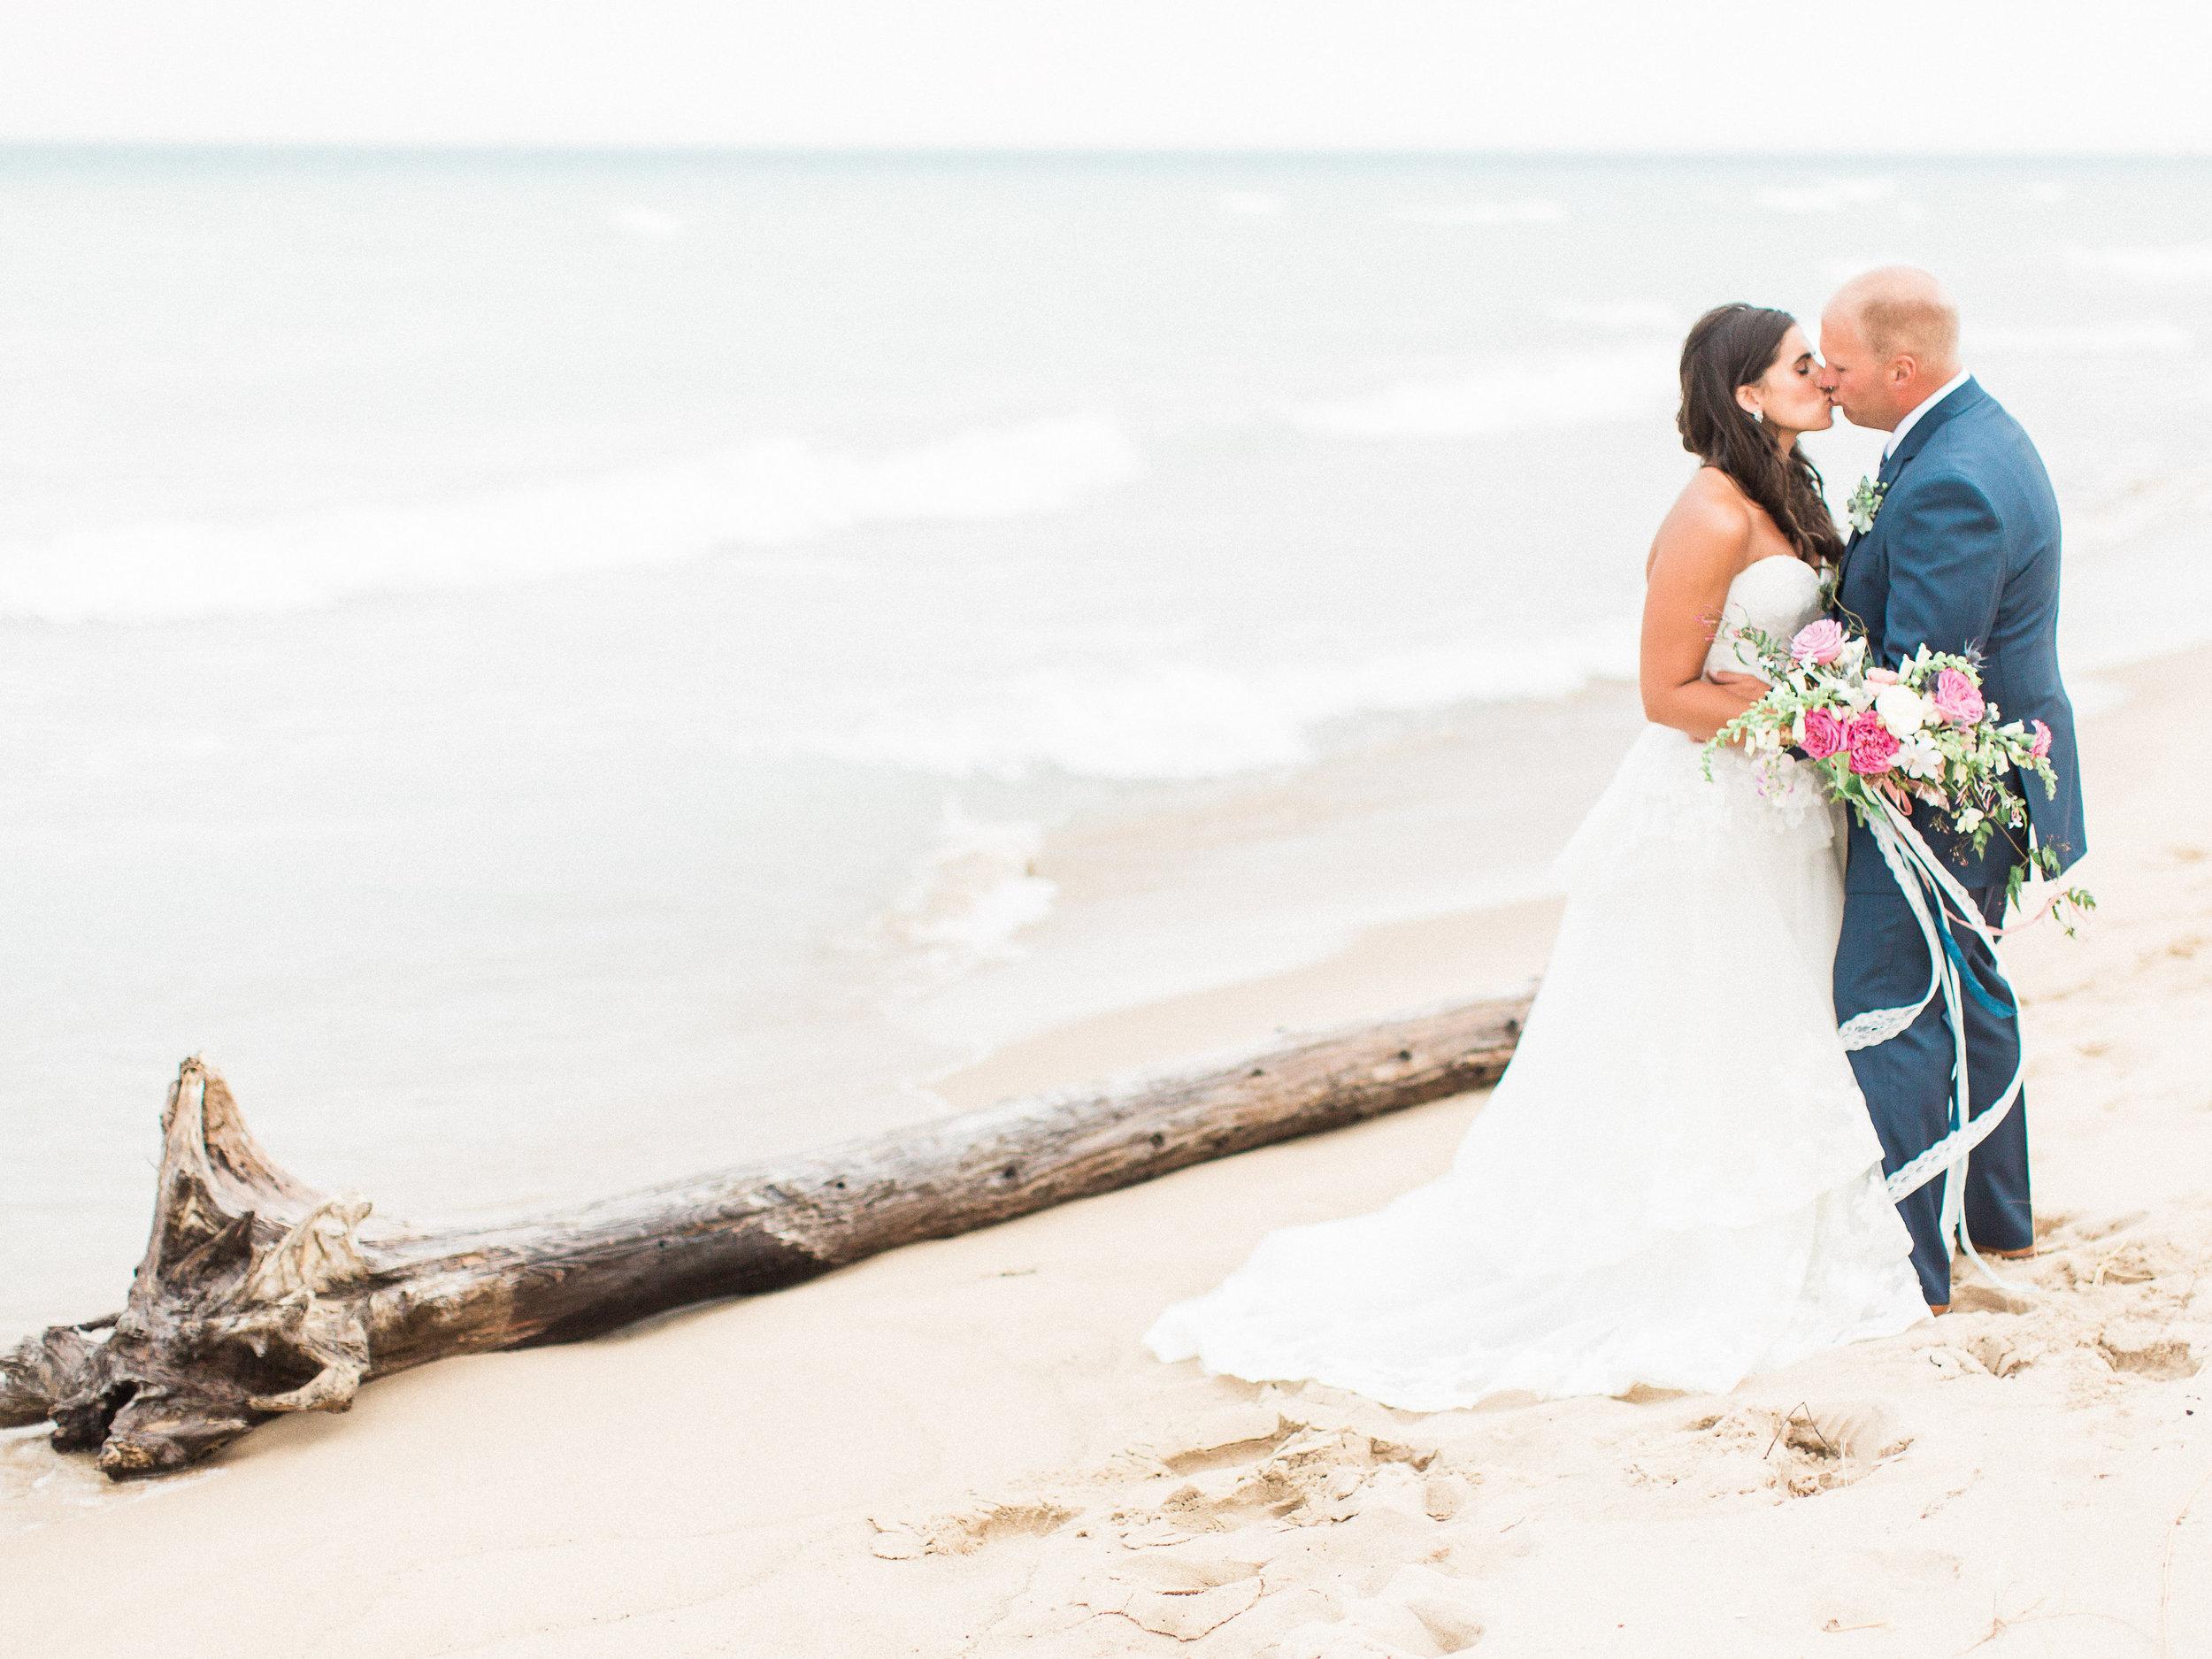 ERIC AND HALLIE WEDDING-HI RESOLUTION FOR PRINTING-0718.jpg